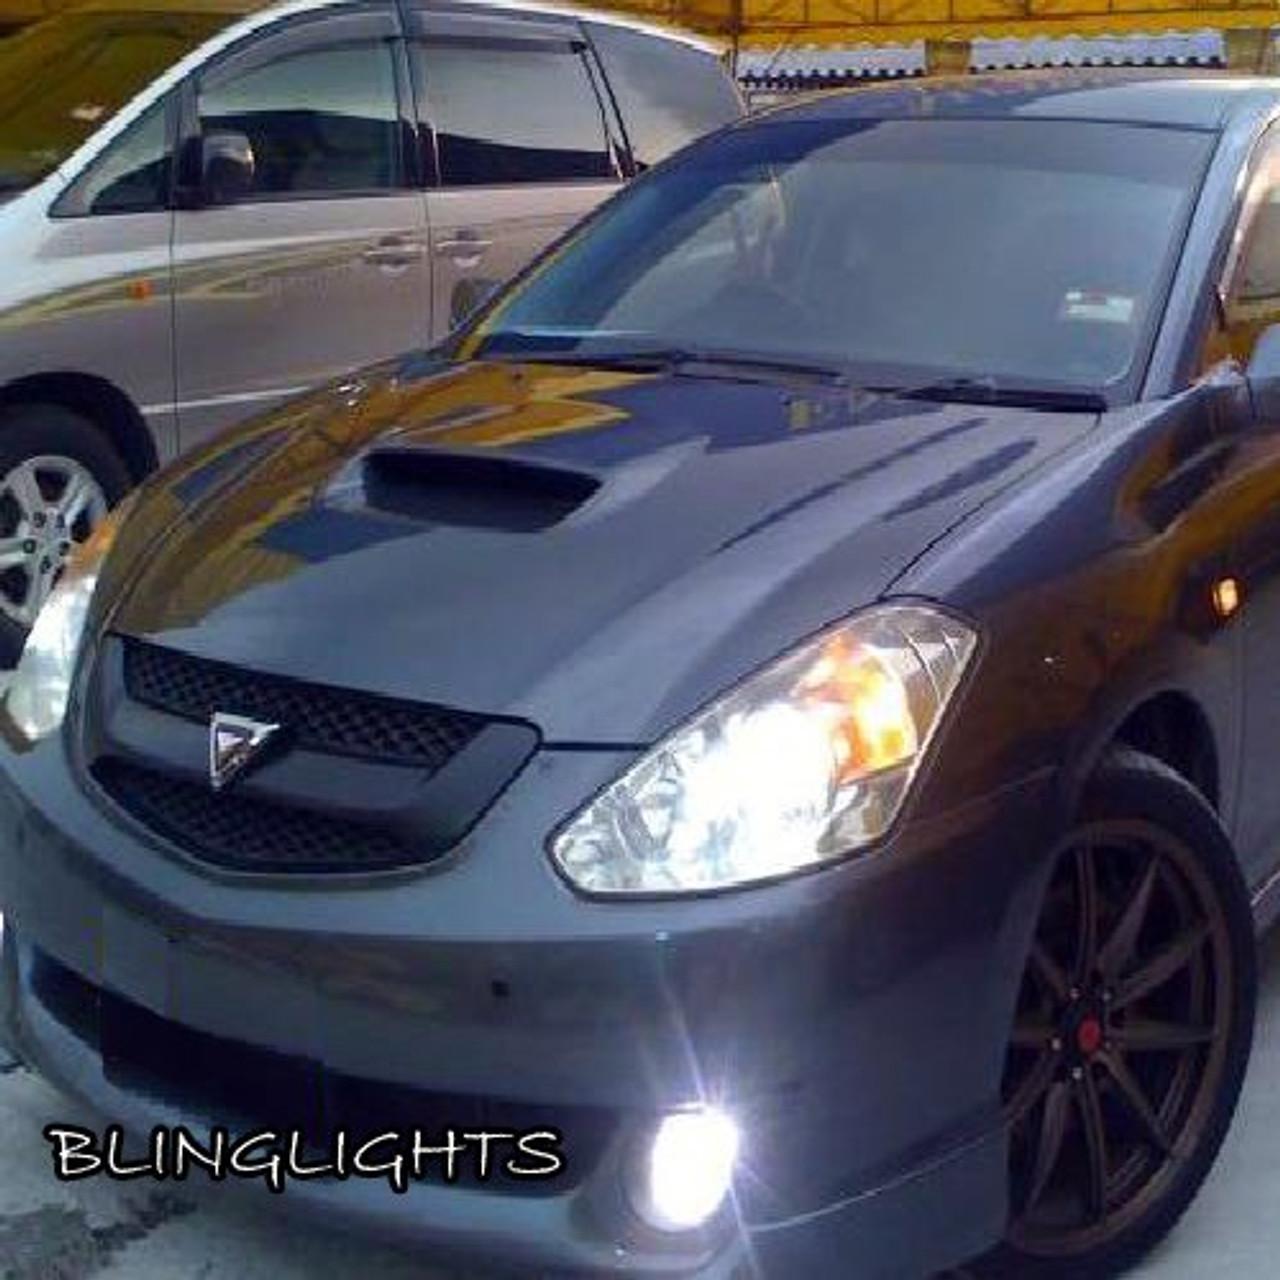 2002 2003 2004 2005 2006 2007 Toyota Caldina Xenon Fog Lamps Driving Lights Foglamps Foglights Kit